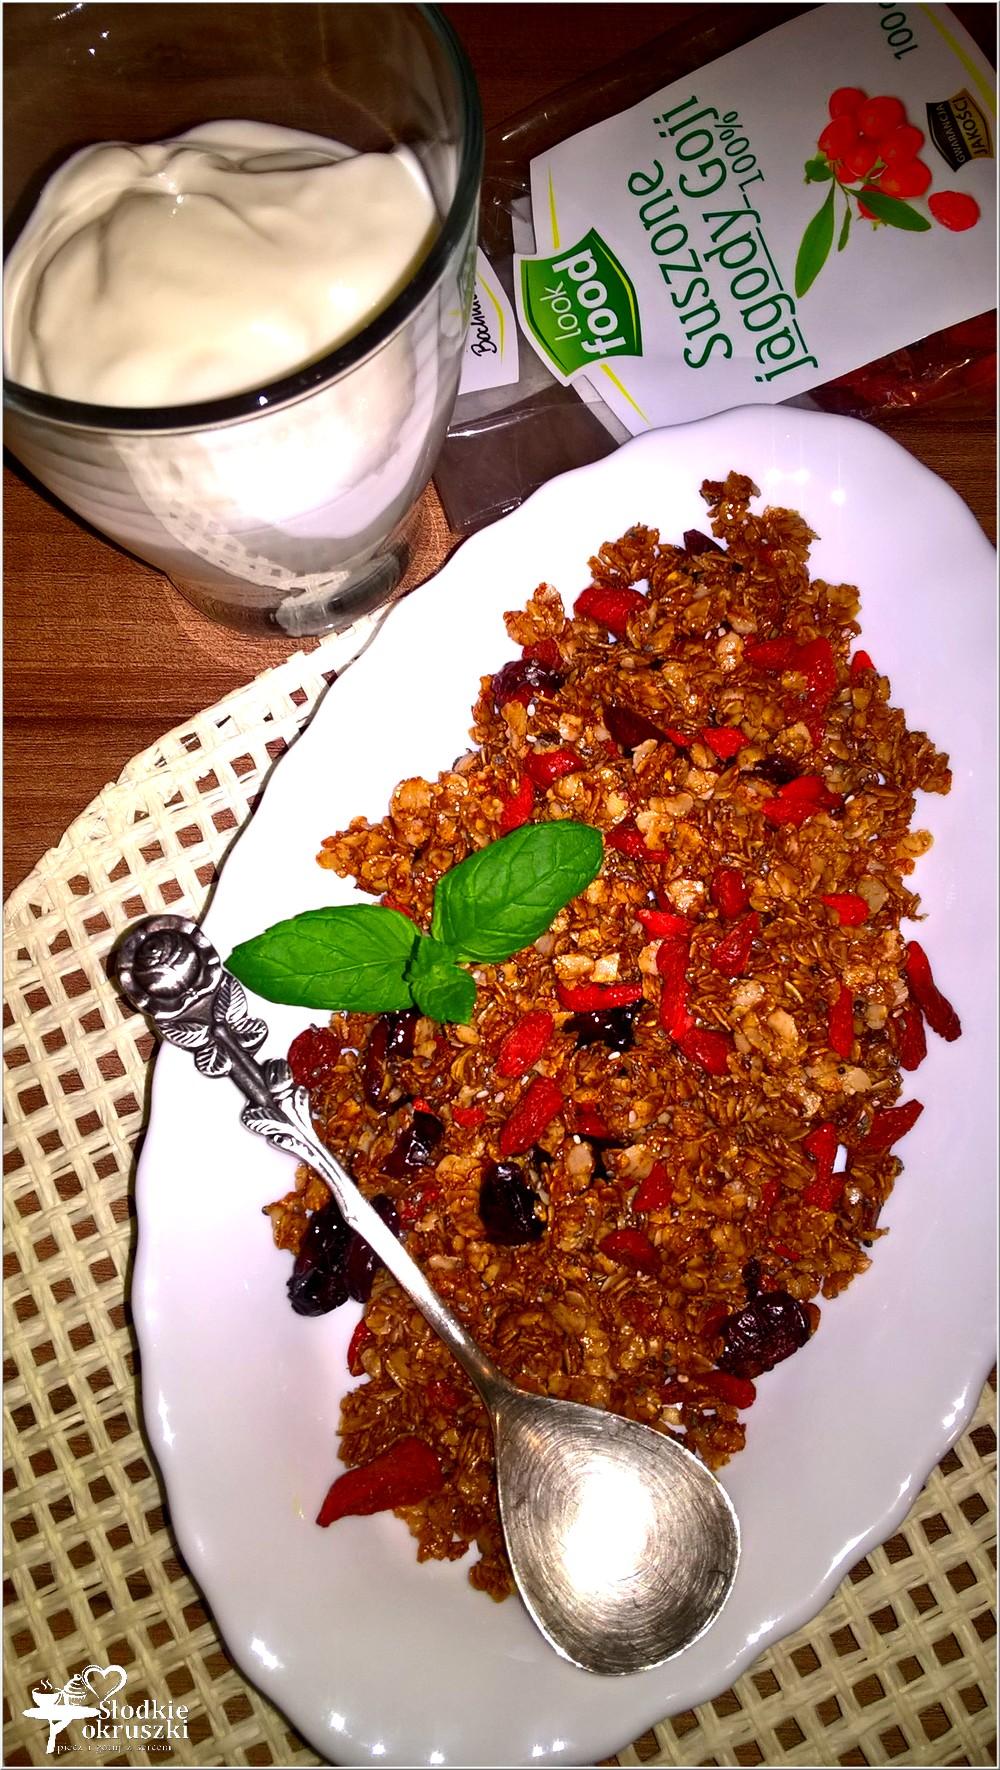 domowa-granola-z-melasa-i-jagodami-goji-2